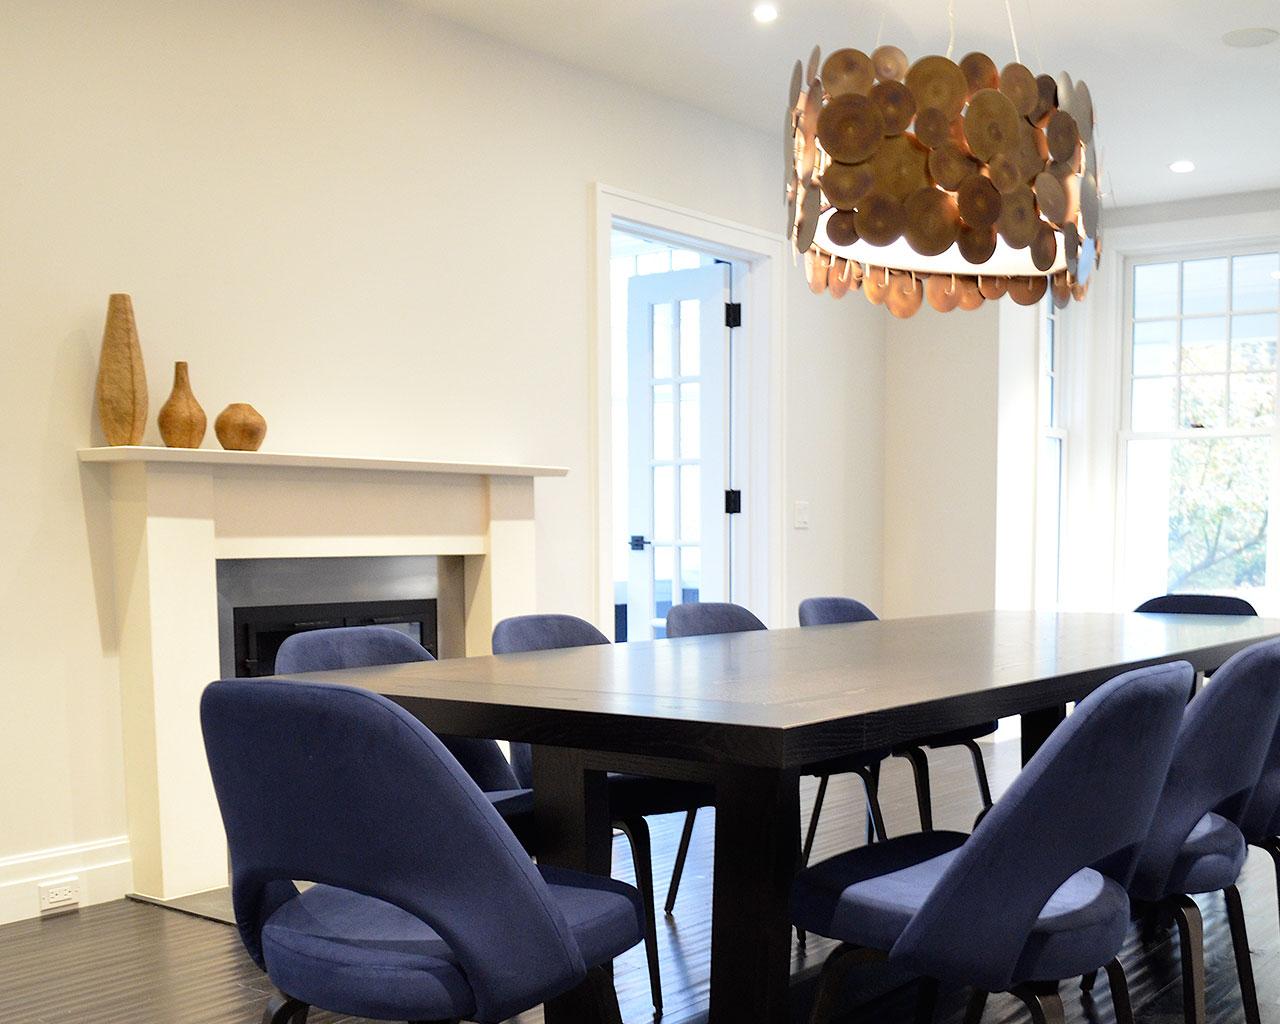 Using Eero Saarinen Dining Room Chairs In Midnight Blue Velvet For This Fabulous